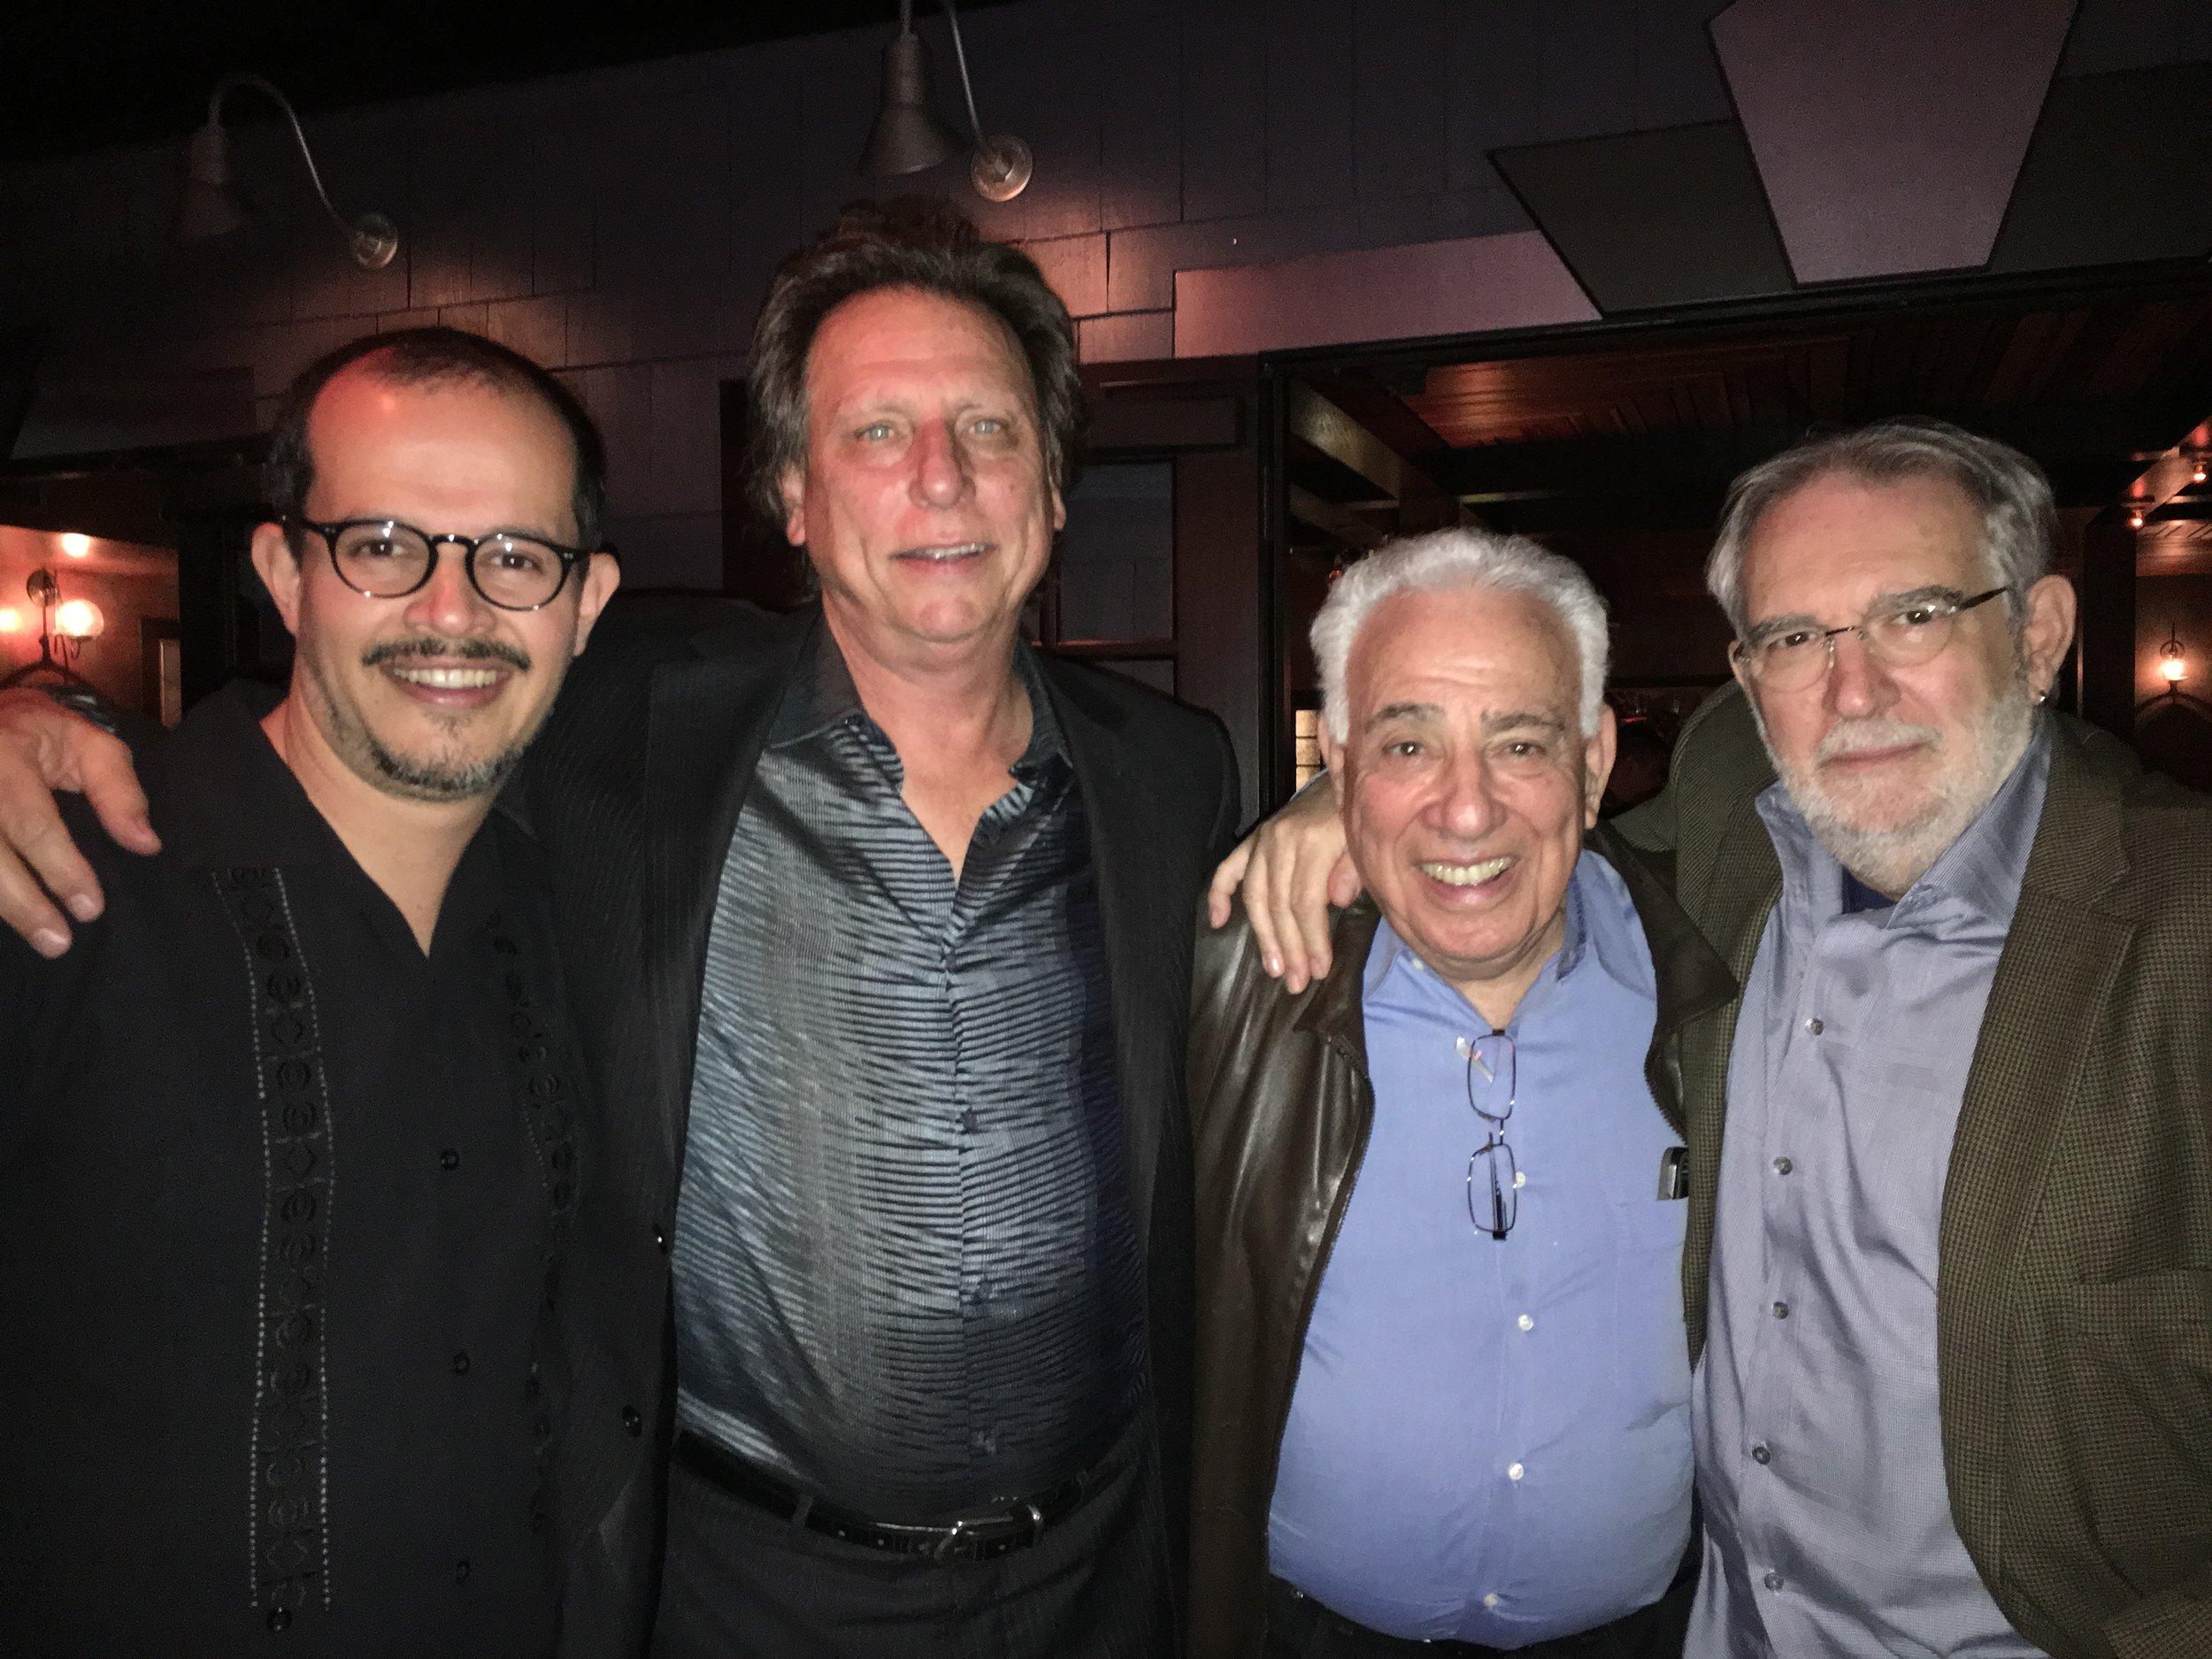 Pablo Munguia, Paul Sandweiss, Michael Seligman